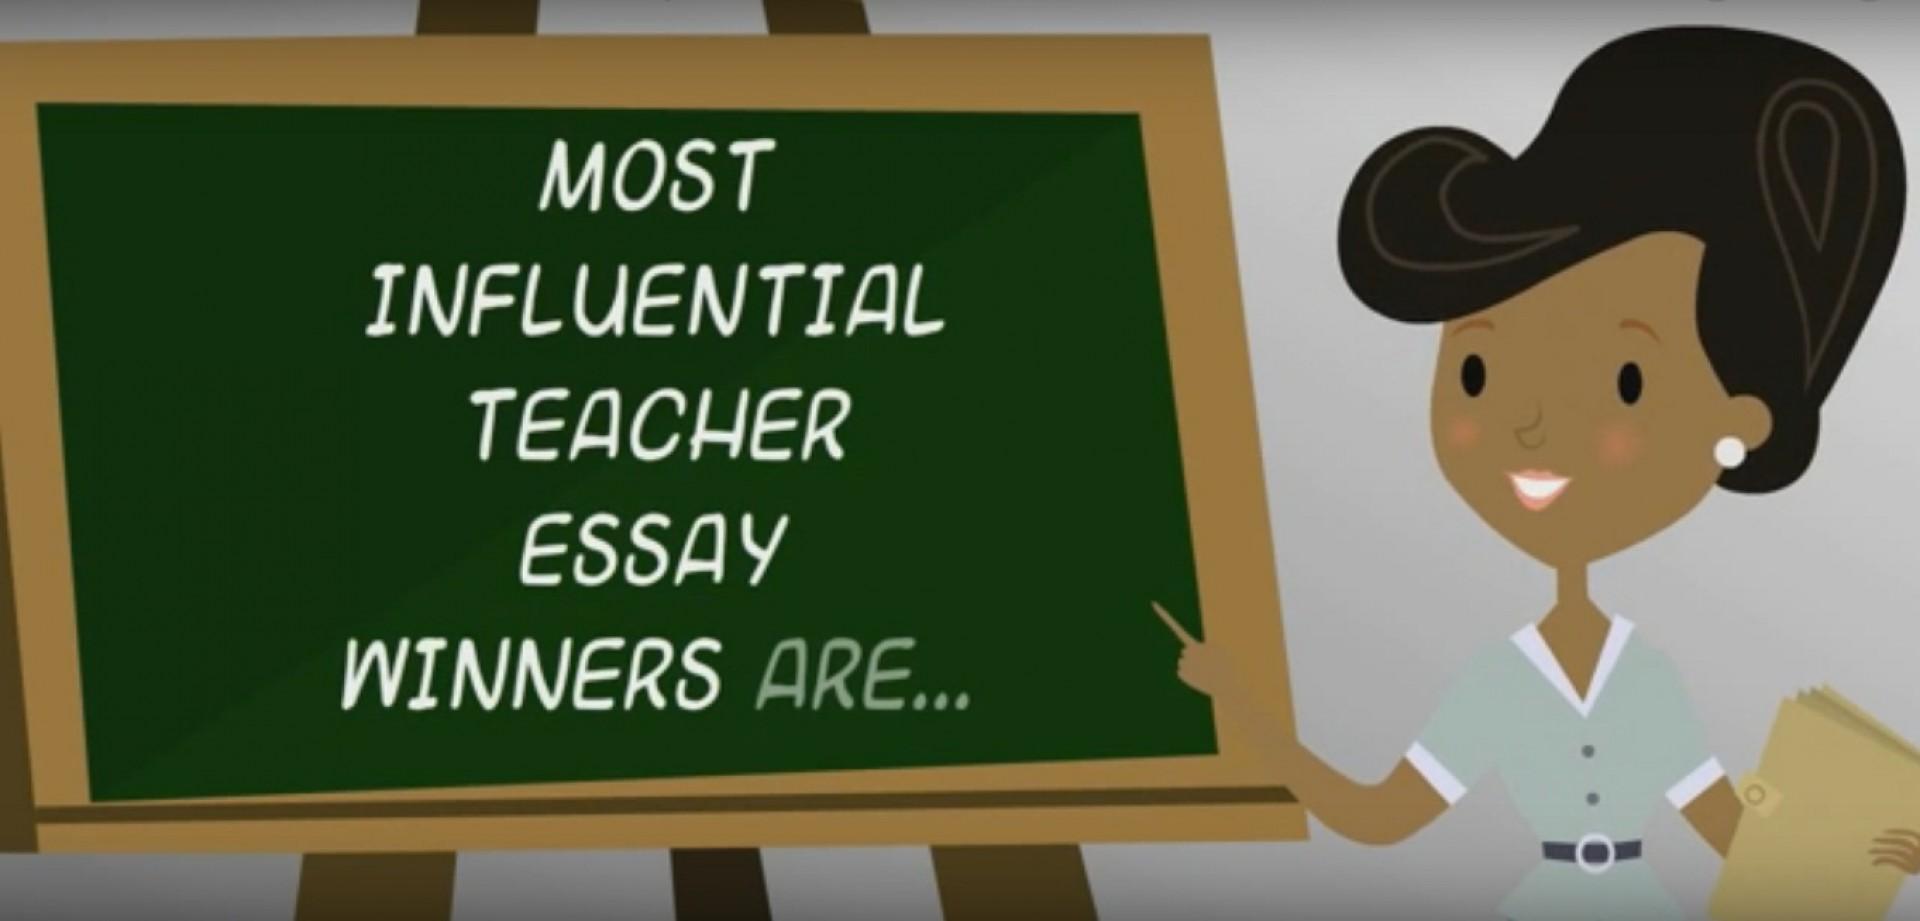 001 Fetterman Scholarship My Most Influential Teacher Essay Fascinating 1920